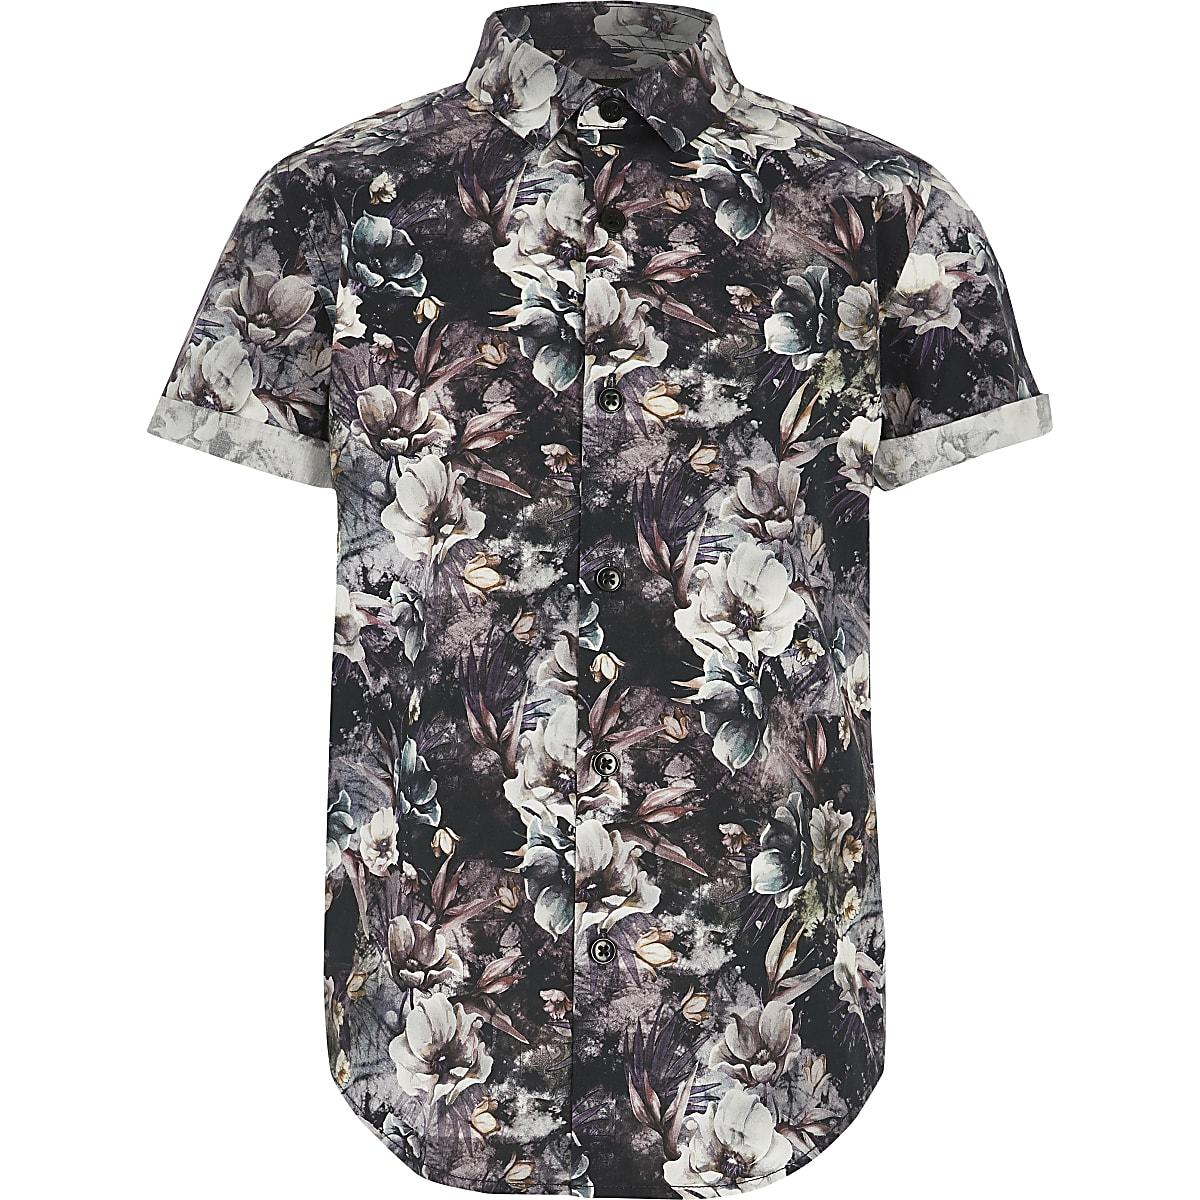 Schwarzes, geblümtes Popeline-Hemd